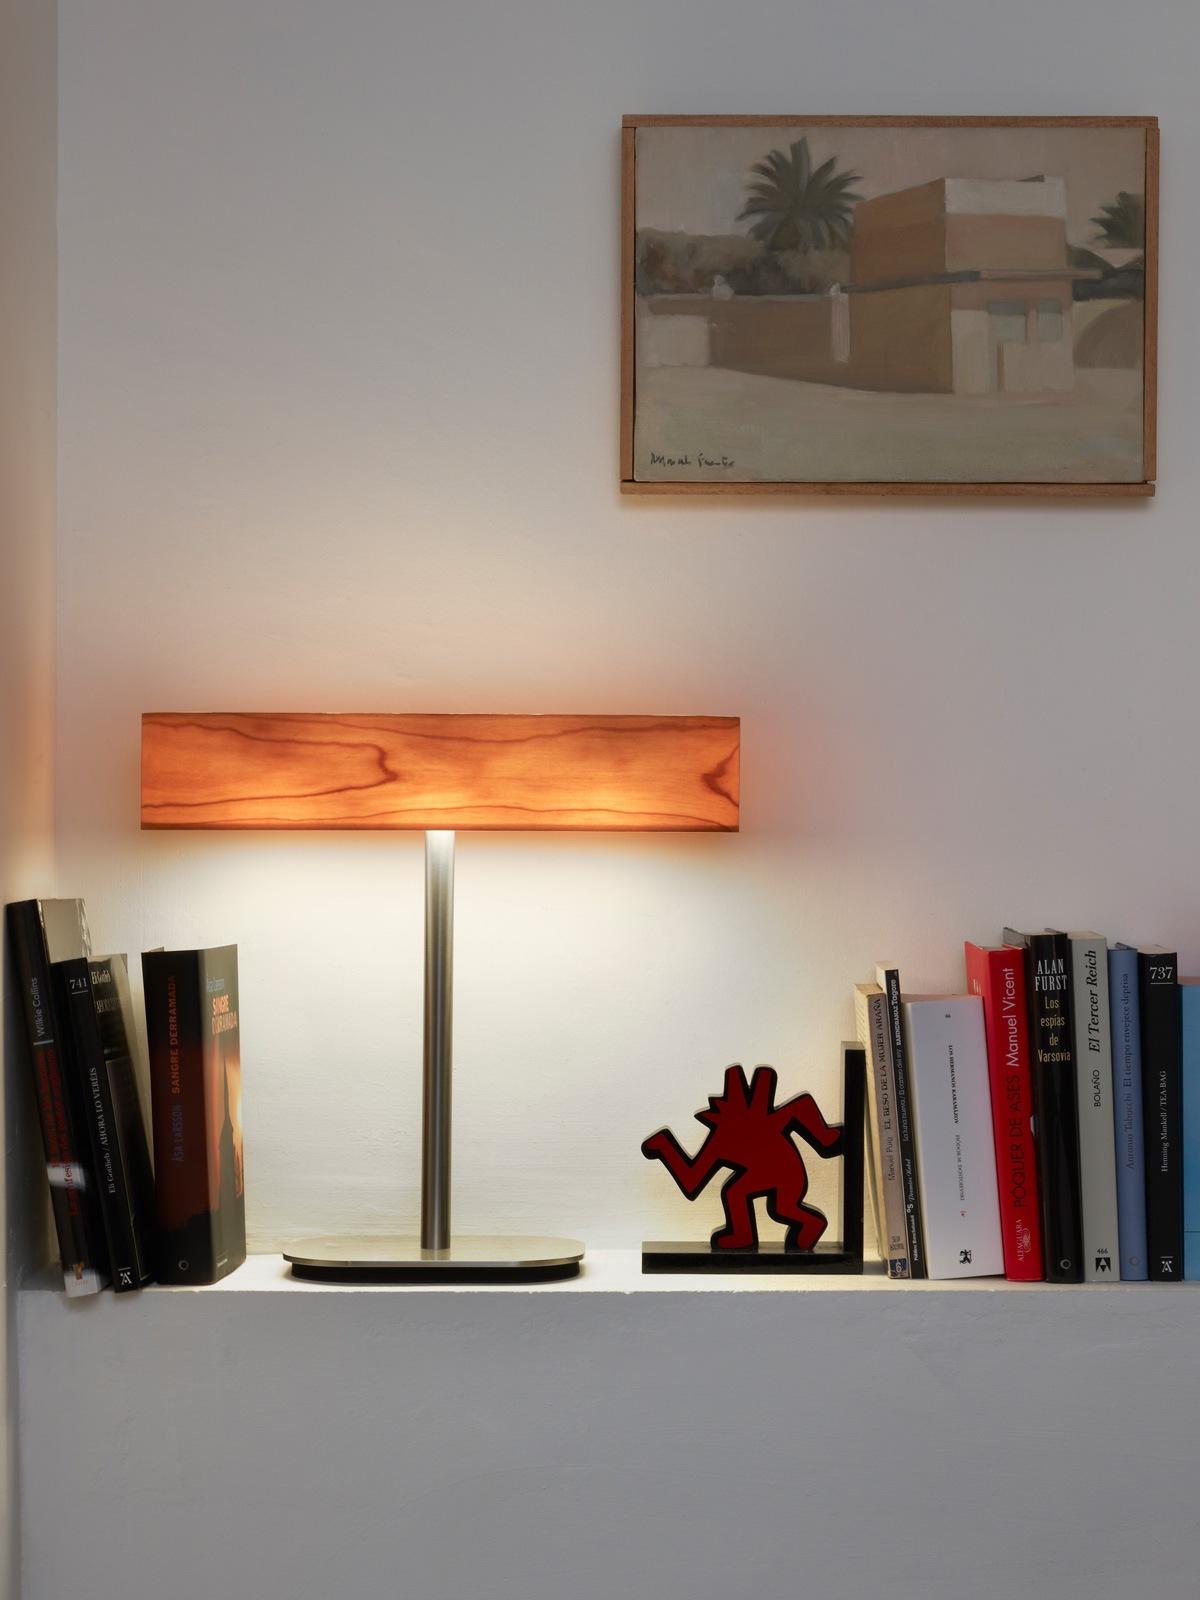 I Club M Tischleuchte LZF Lamps DesignOrt Lampen Berlin